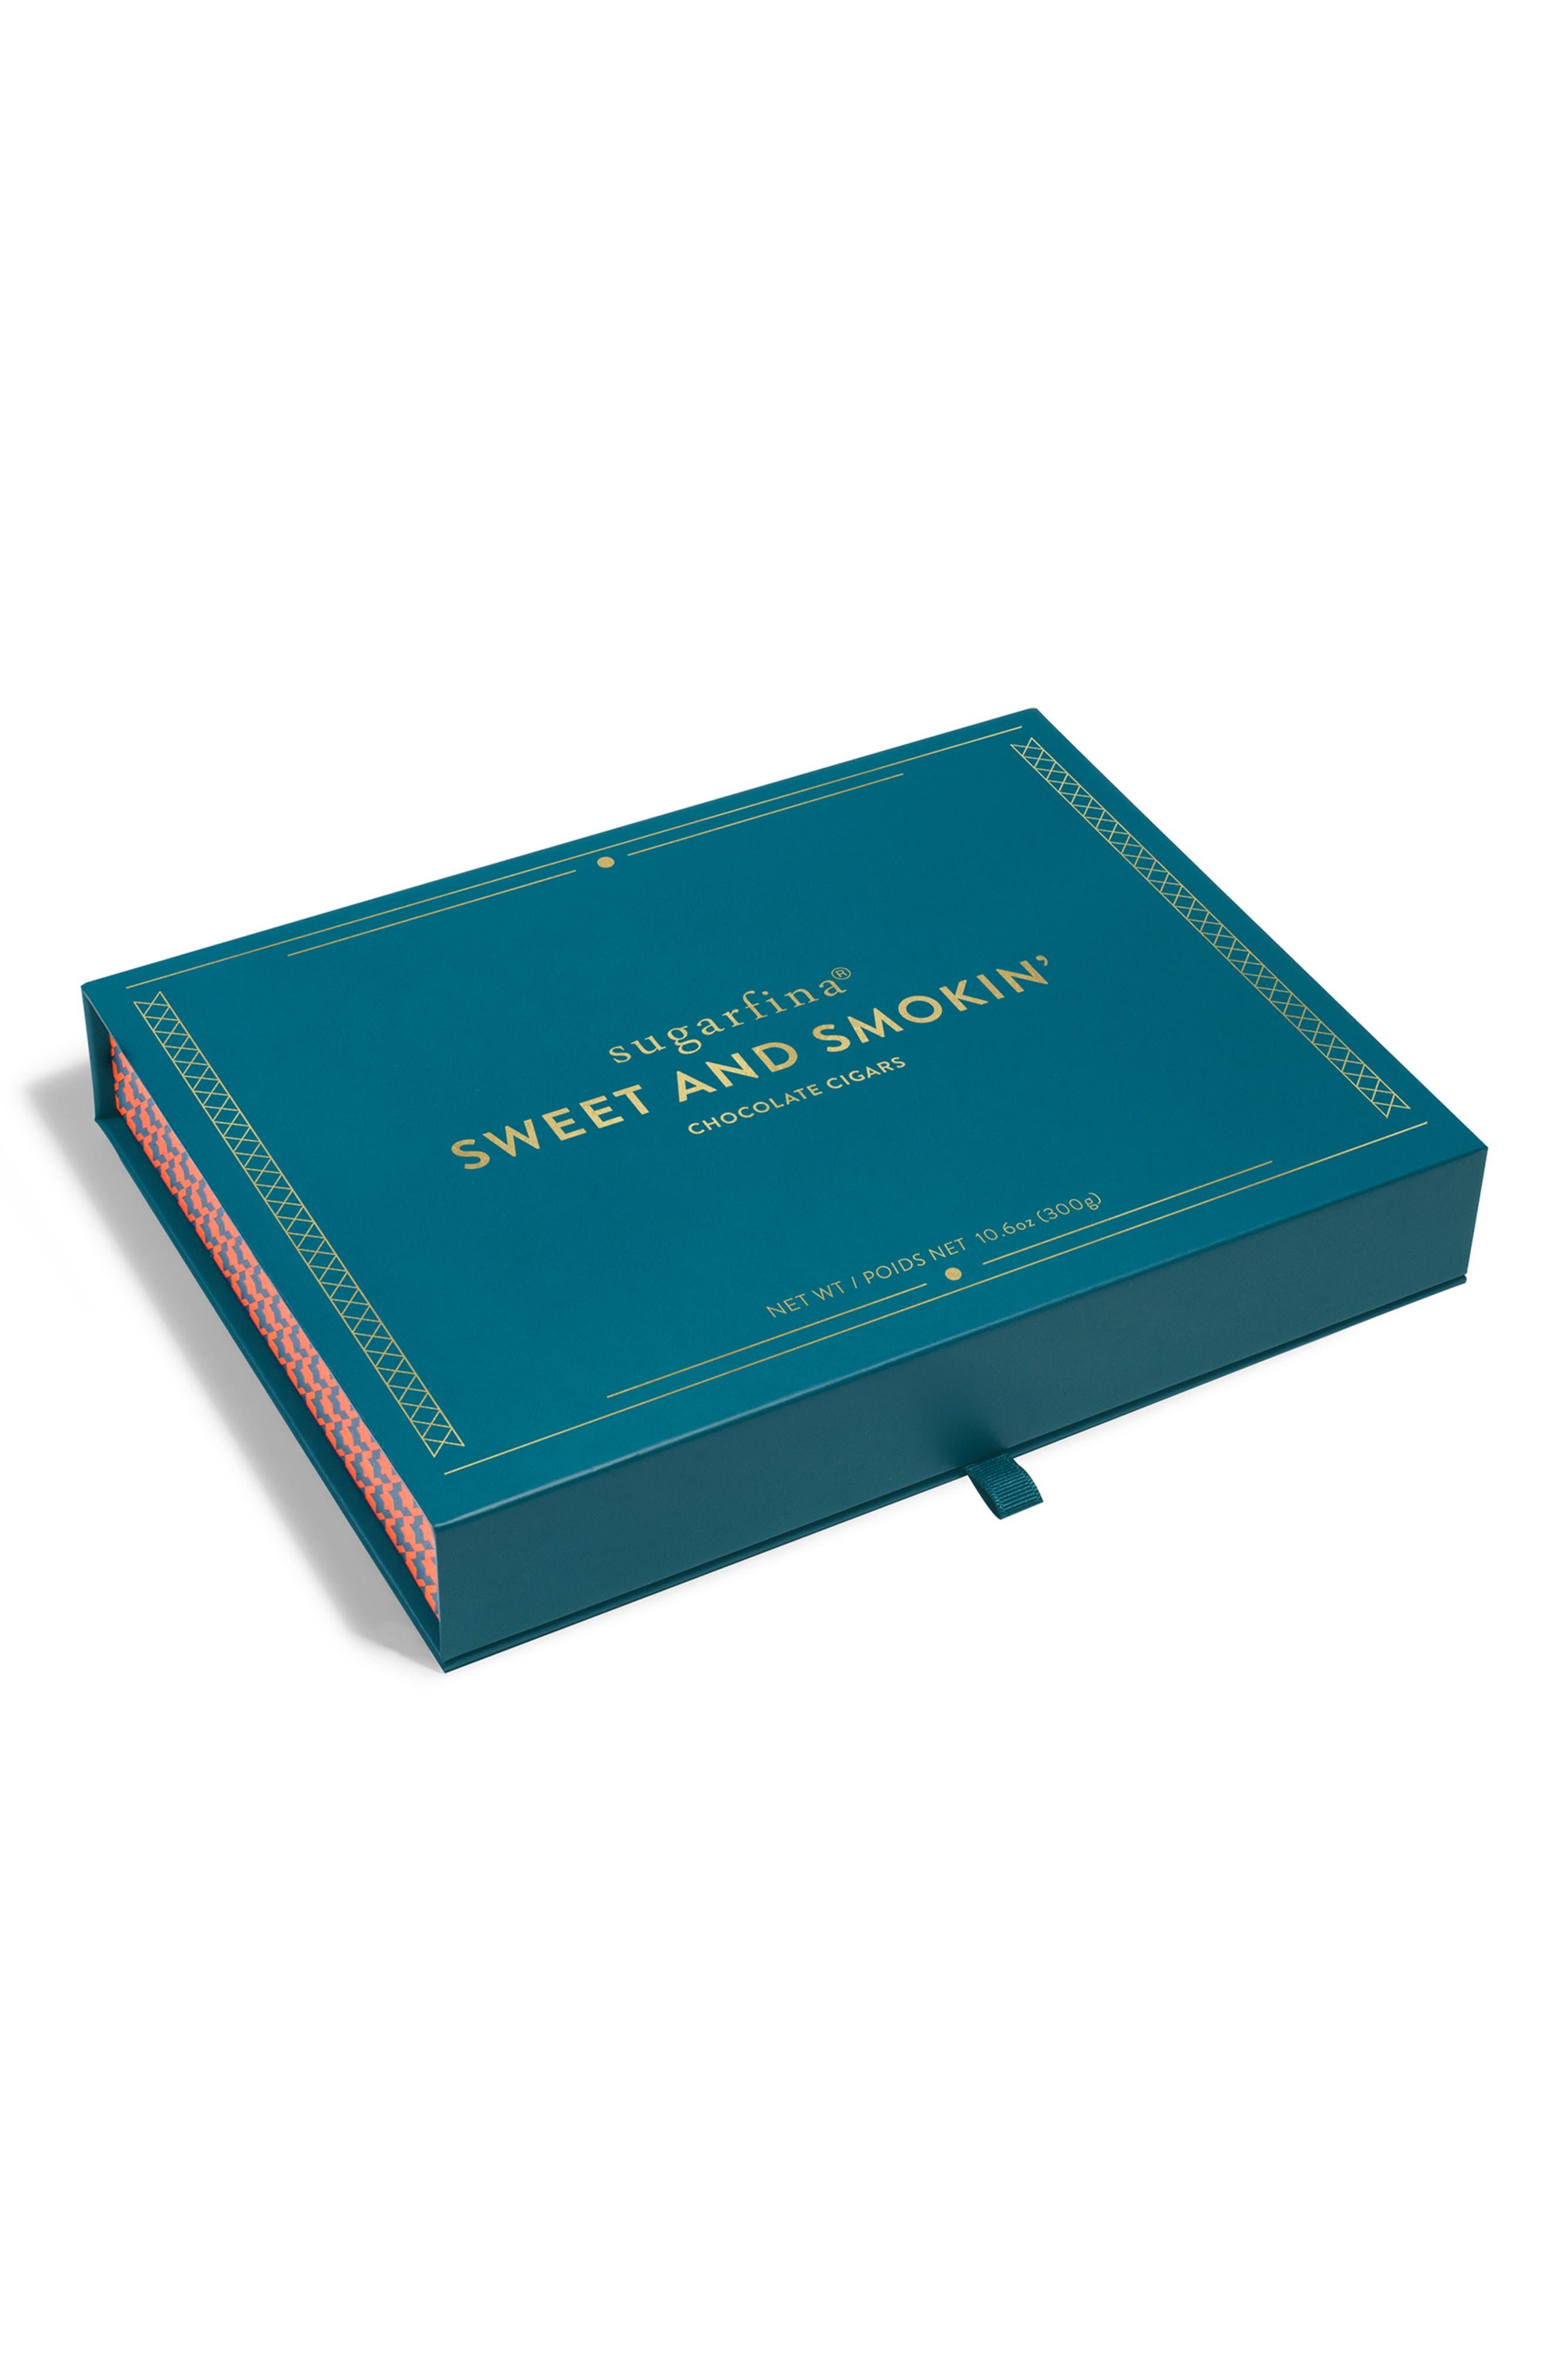 Sweet & Smokin' 3-Piece Chocolate Cigar Box,                             Alternate thumbnail 3, color,                             BLUE